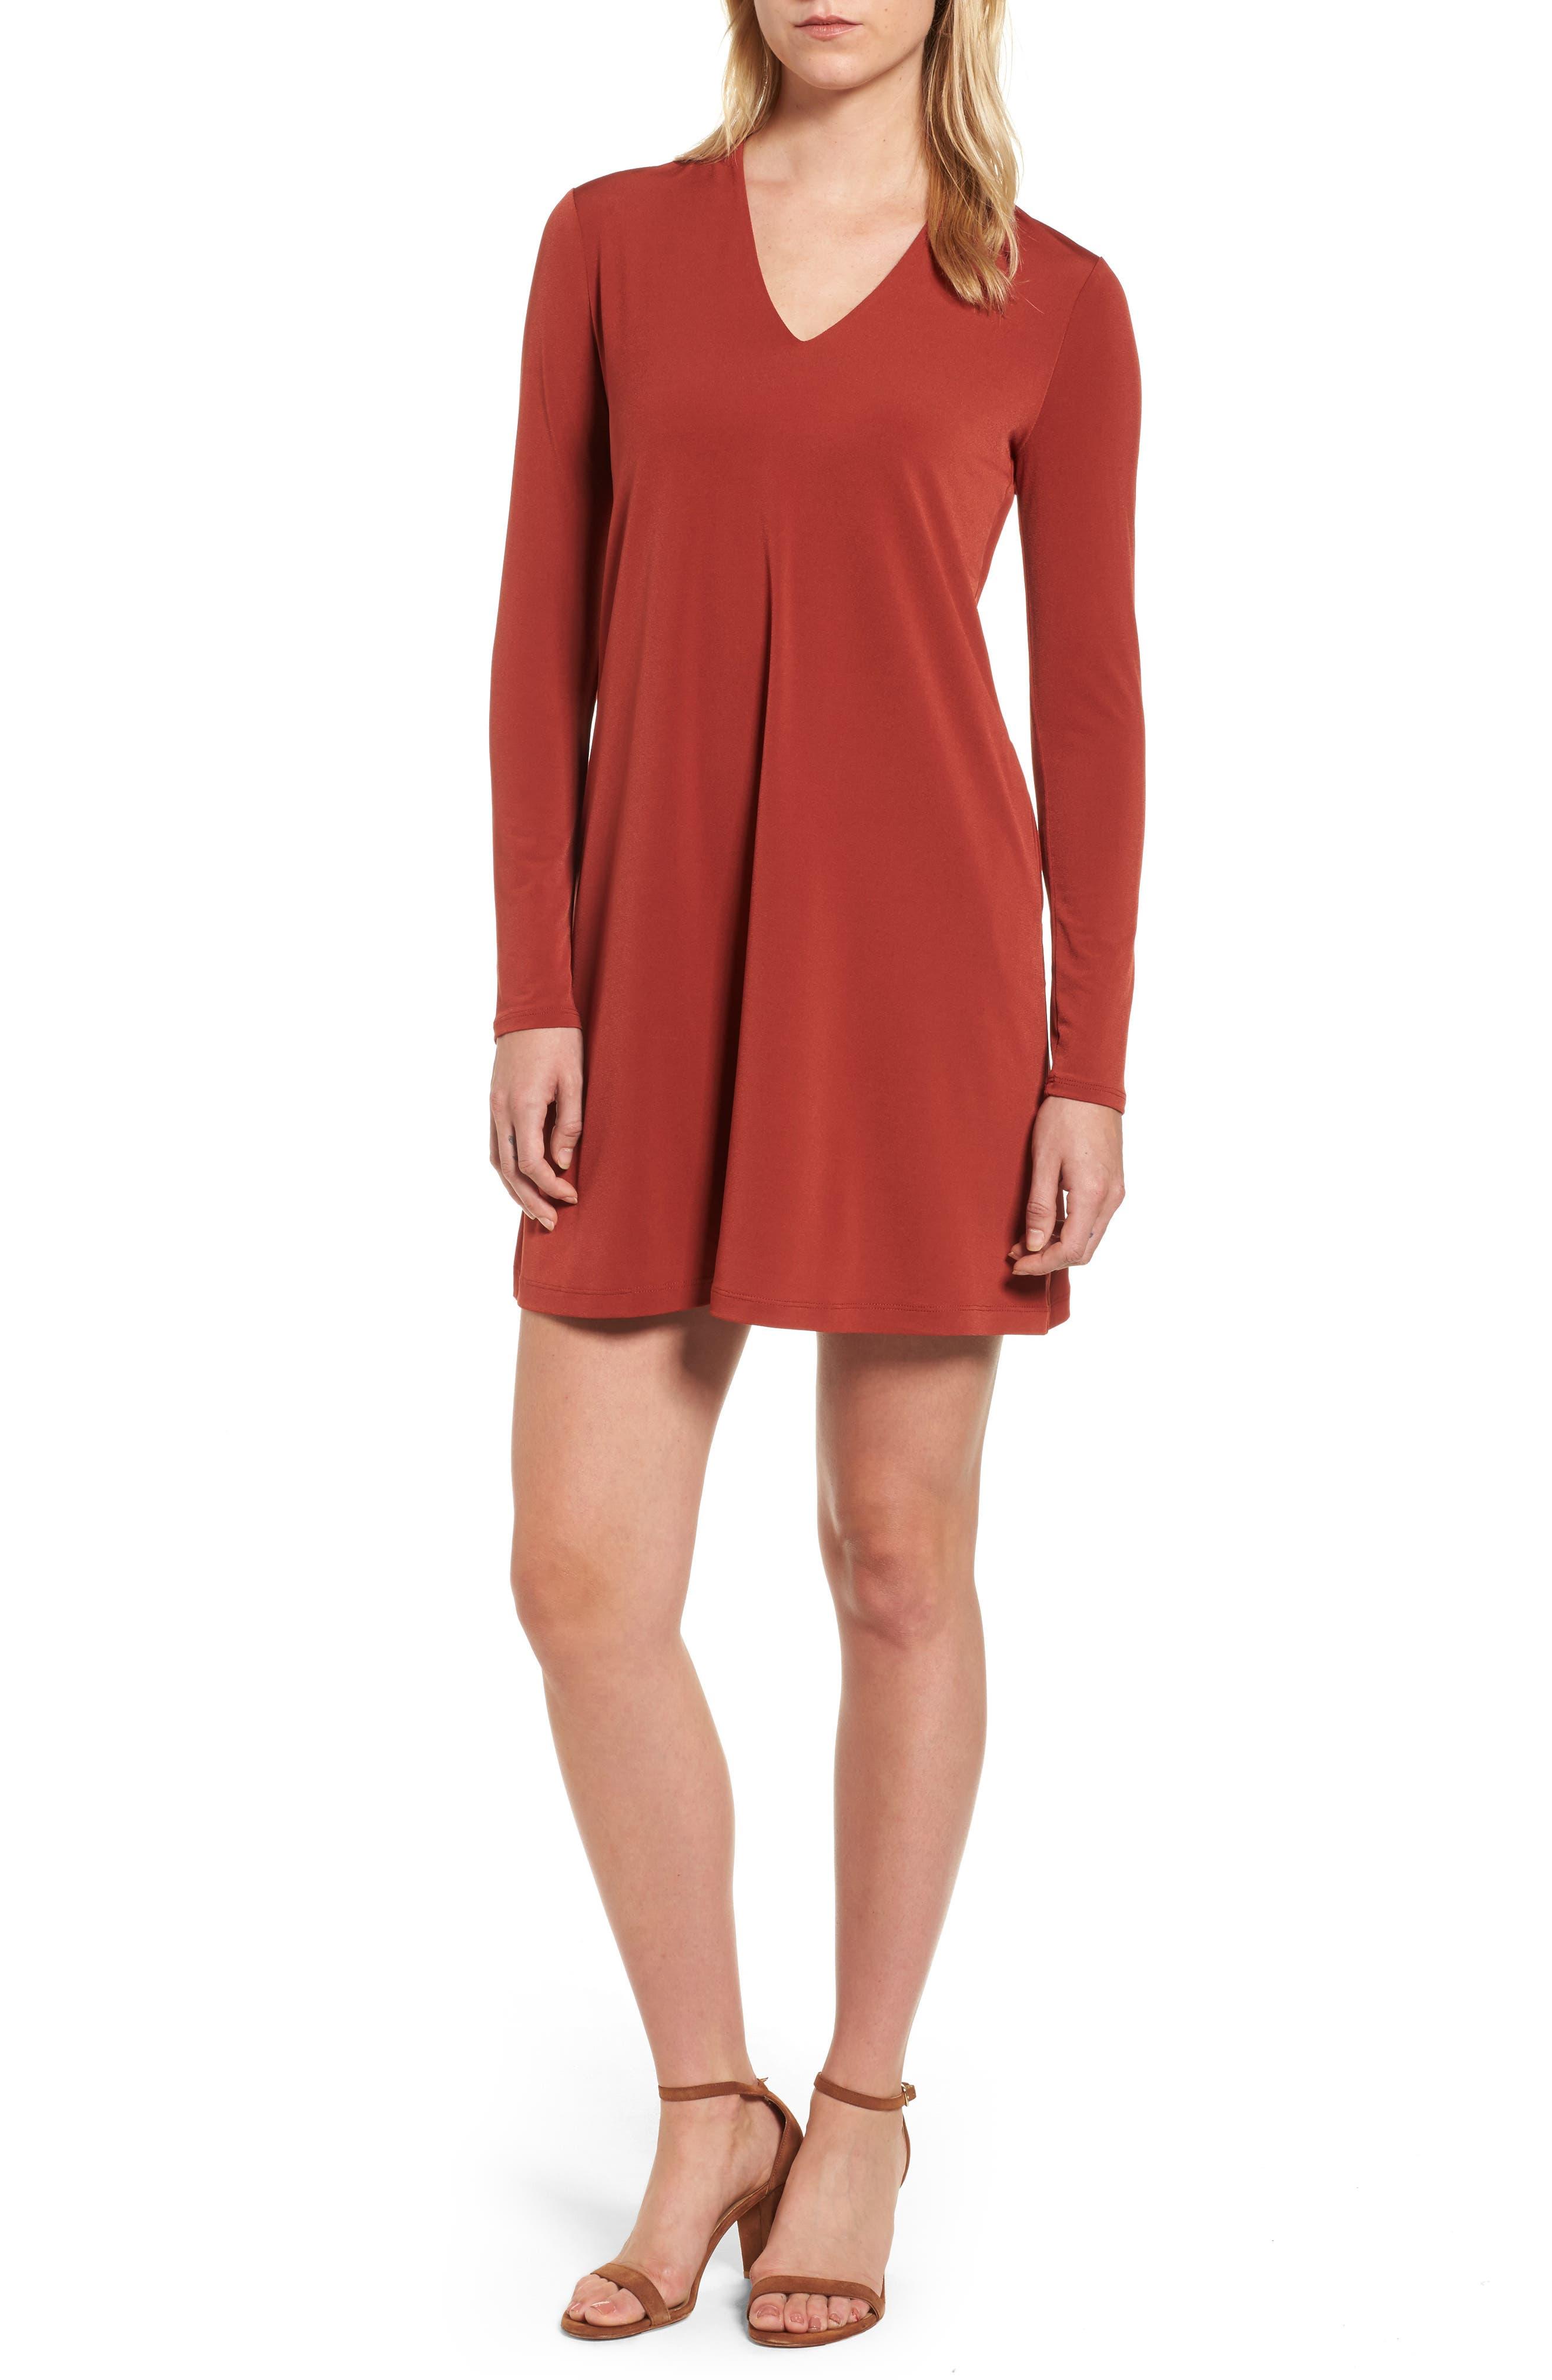 Kenneth Cole New York V-Neck A-Line Dress